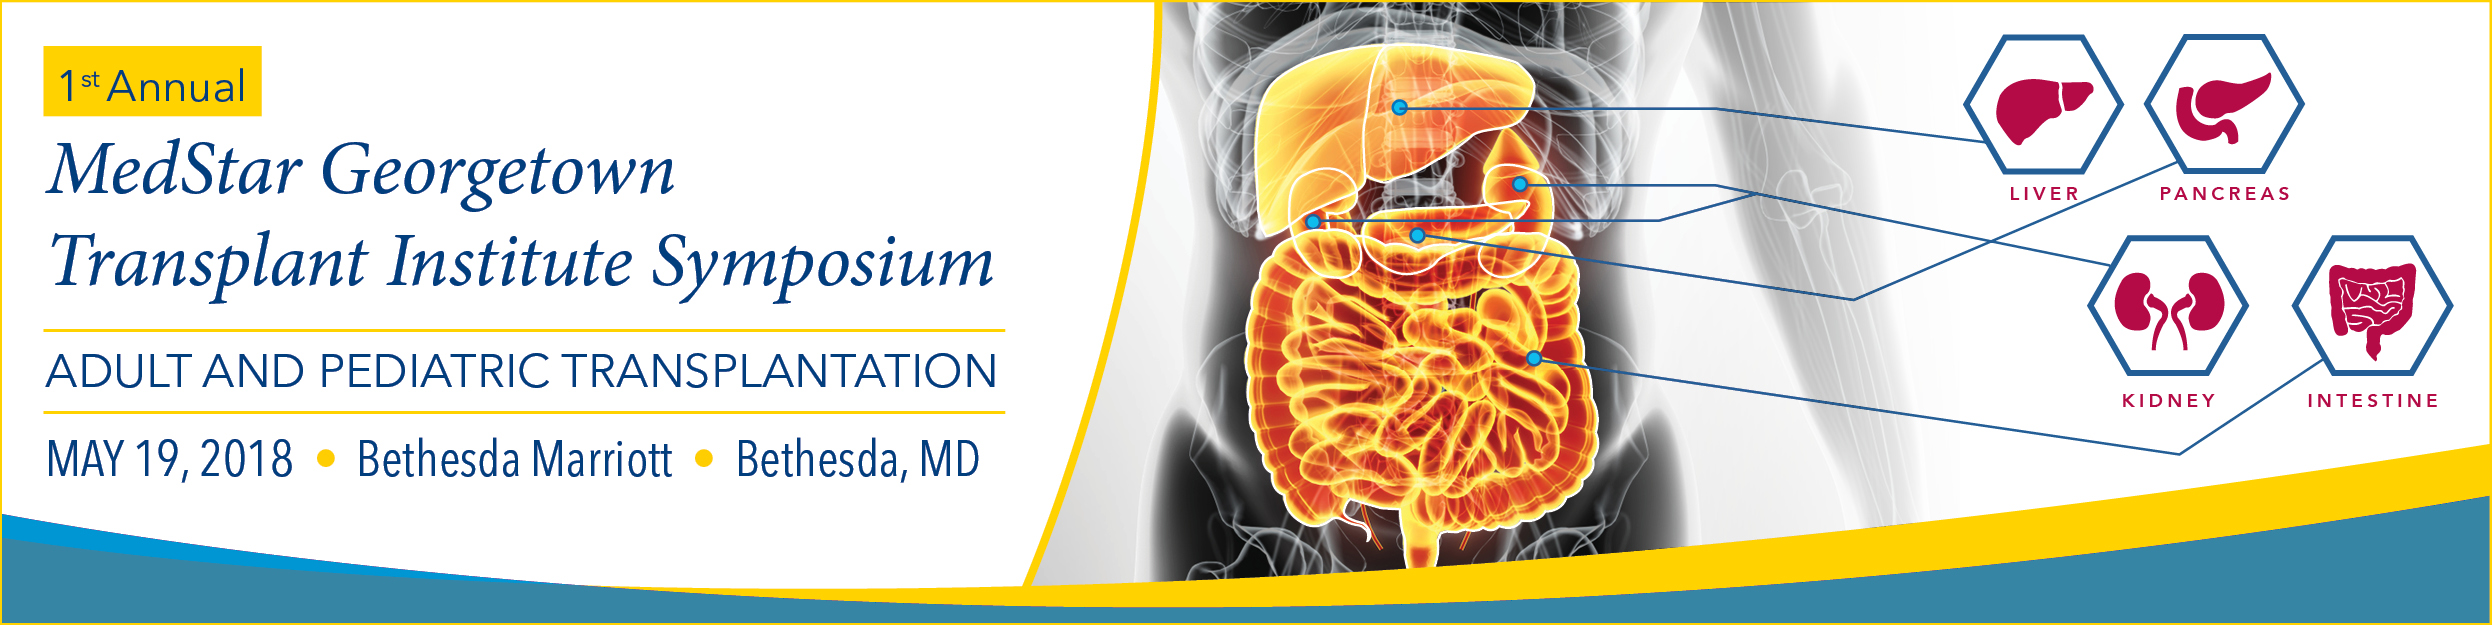 1st Annual MedStar Georgetown Transplant Institute Symposium 2018 Banner